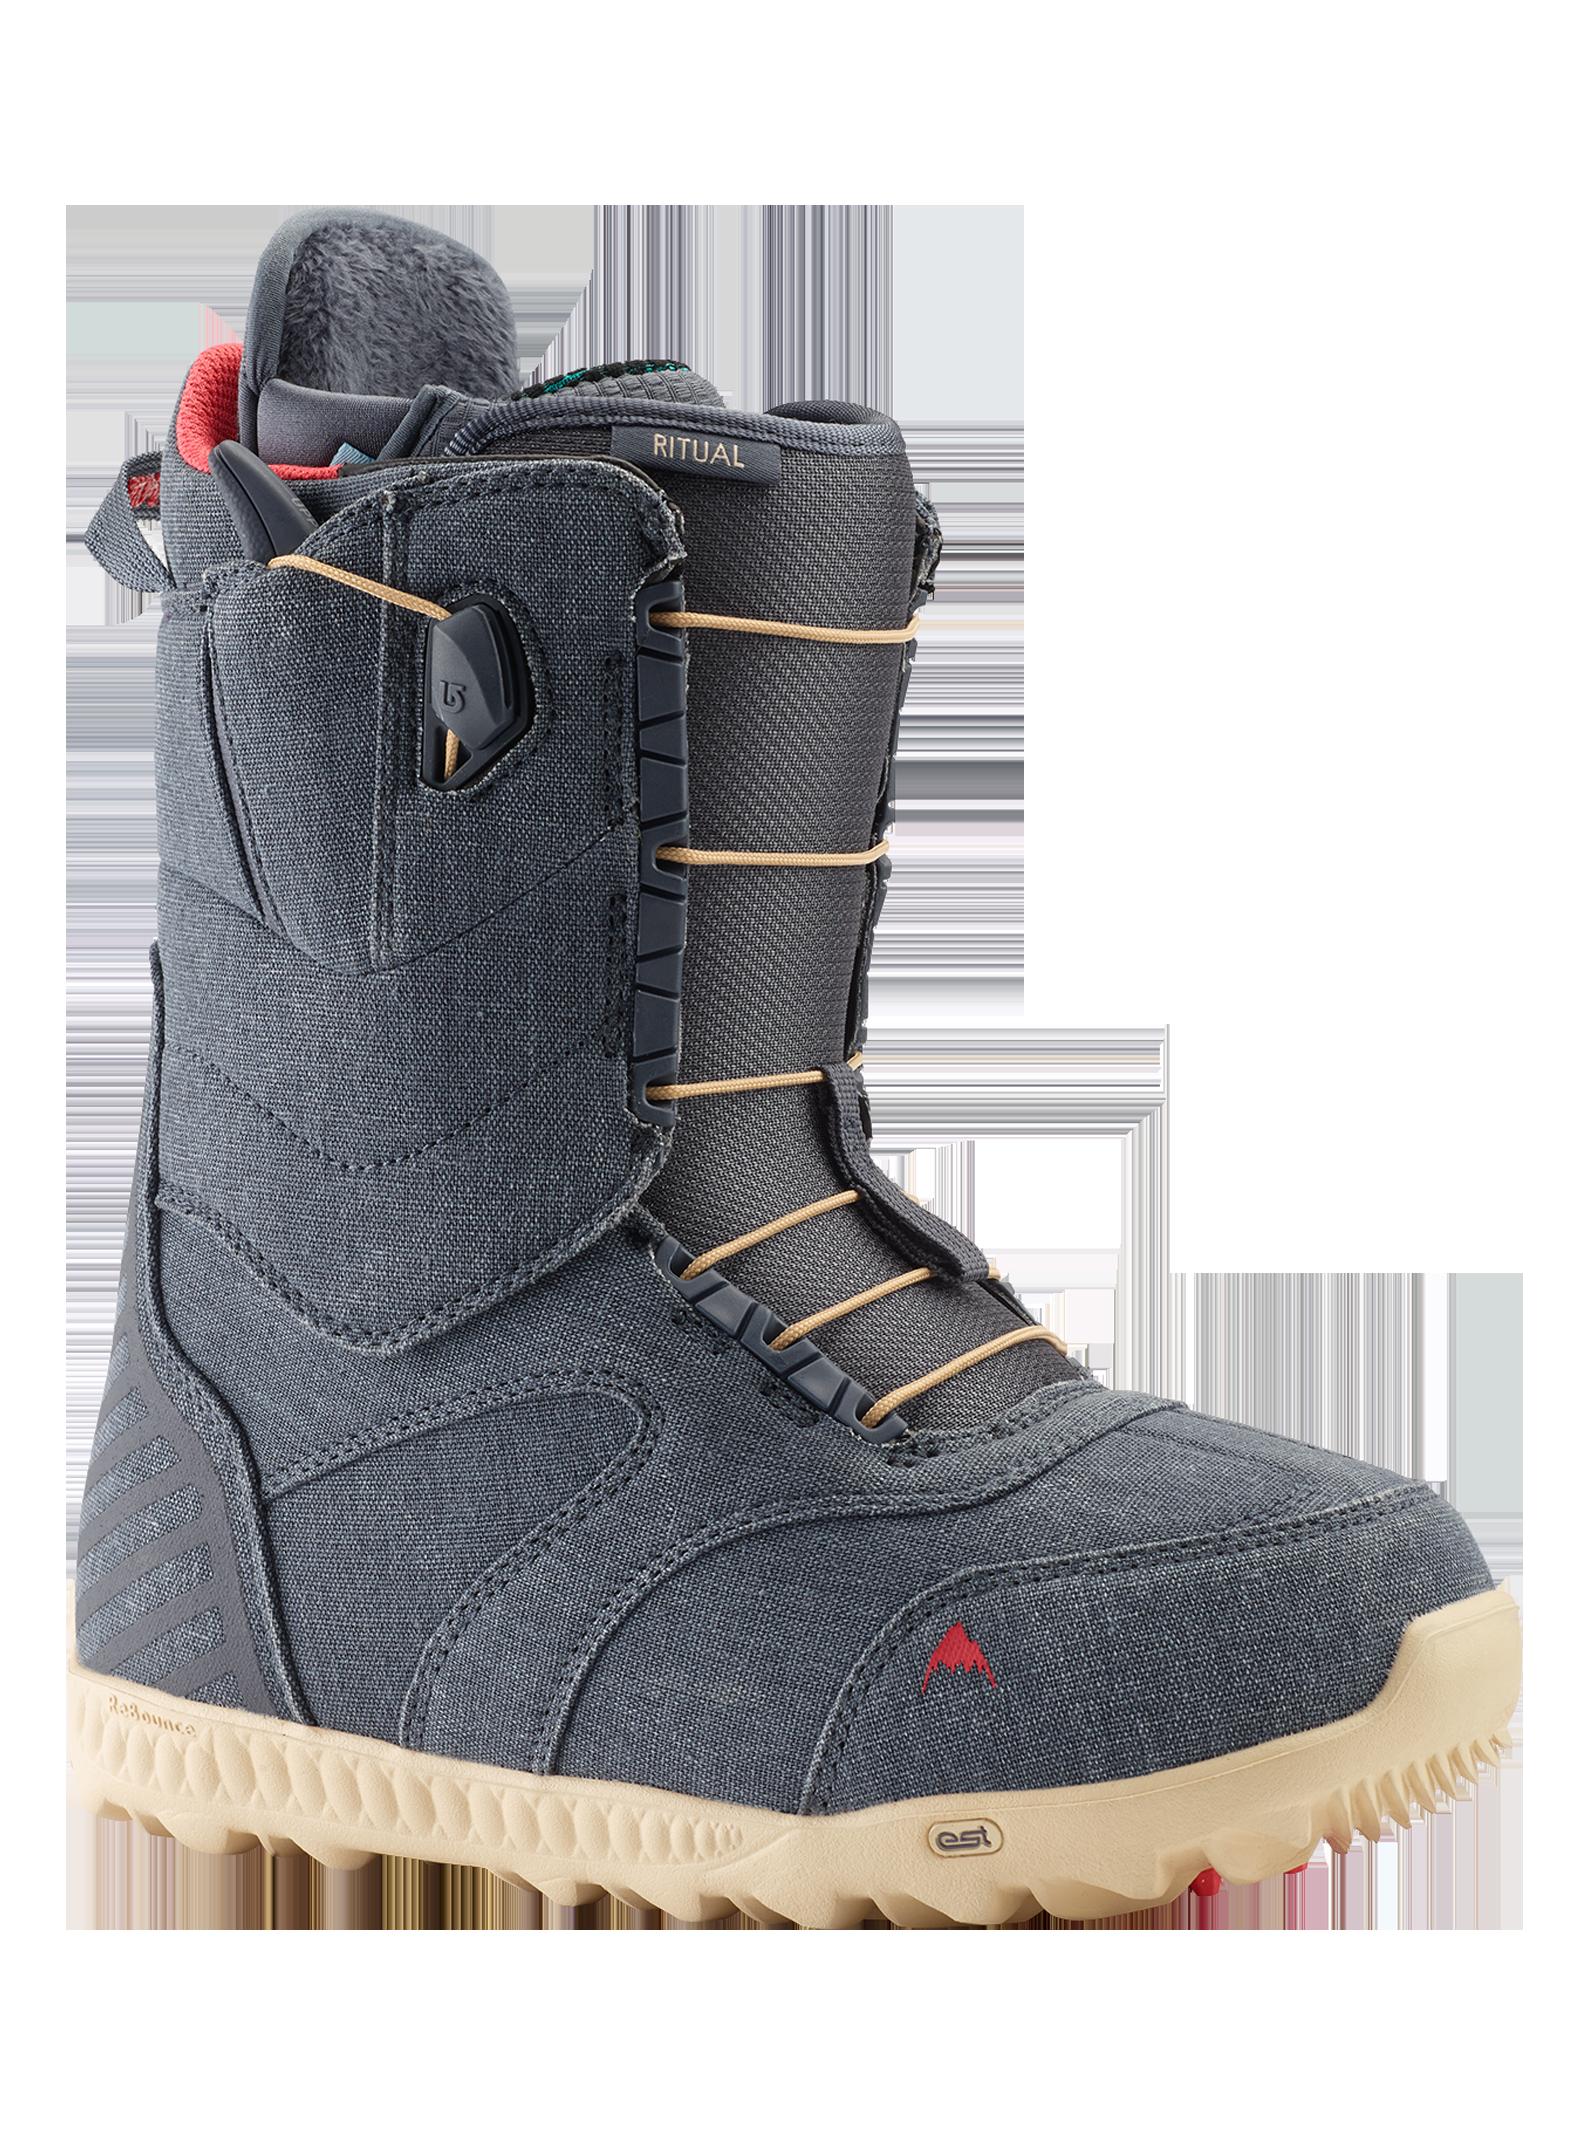 Leash+Stomp+Mask+Burton Decal Package 10 Silence Brown Lav Boot+Wht Binding, 150cm Knotty Hybrid Rocker Symbolic Knotty Womens Snowboard /& Bindings /& Boots